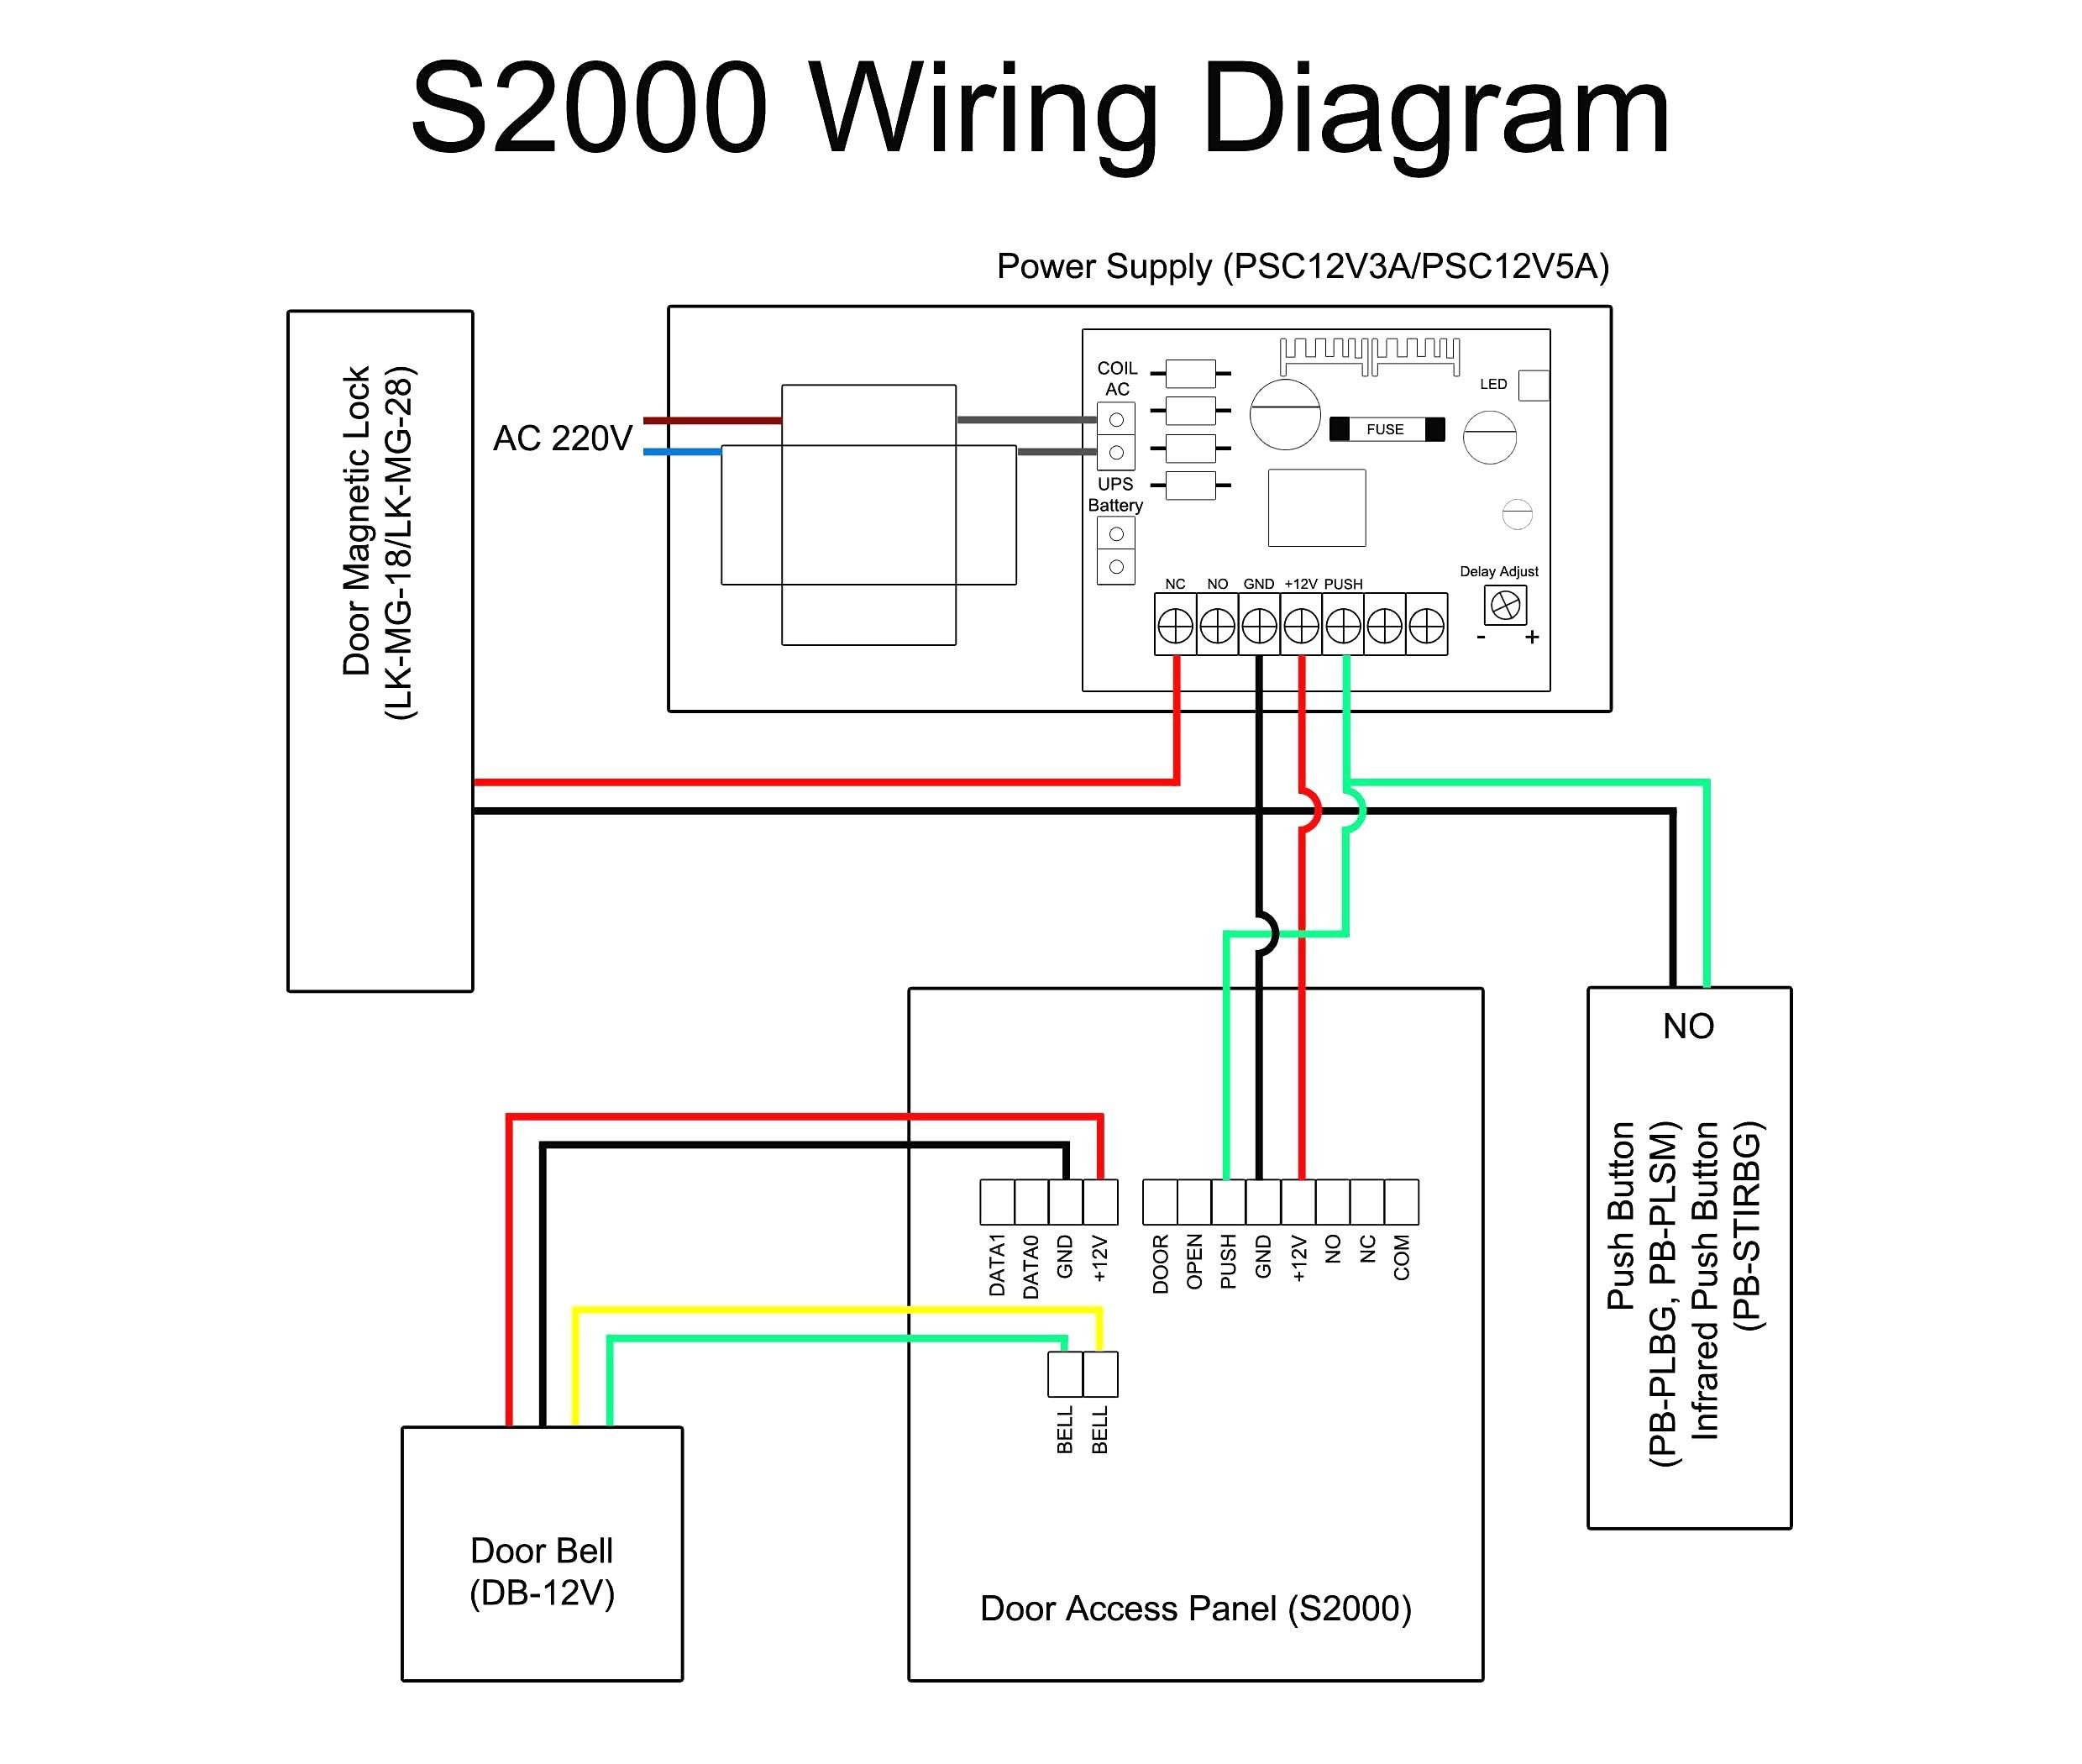 cctv wiring diagrams 2002 subaru wrx stereo diagram pelco data ptz camera manual e books schlage d